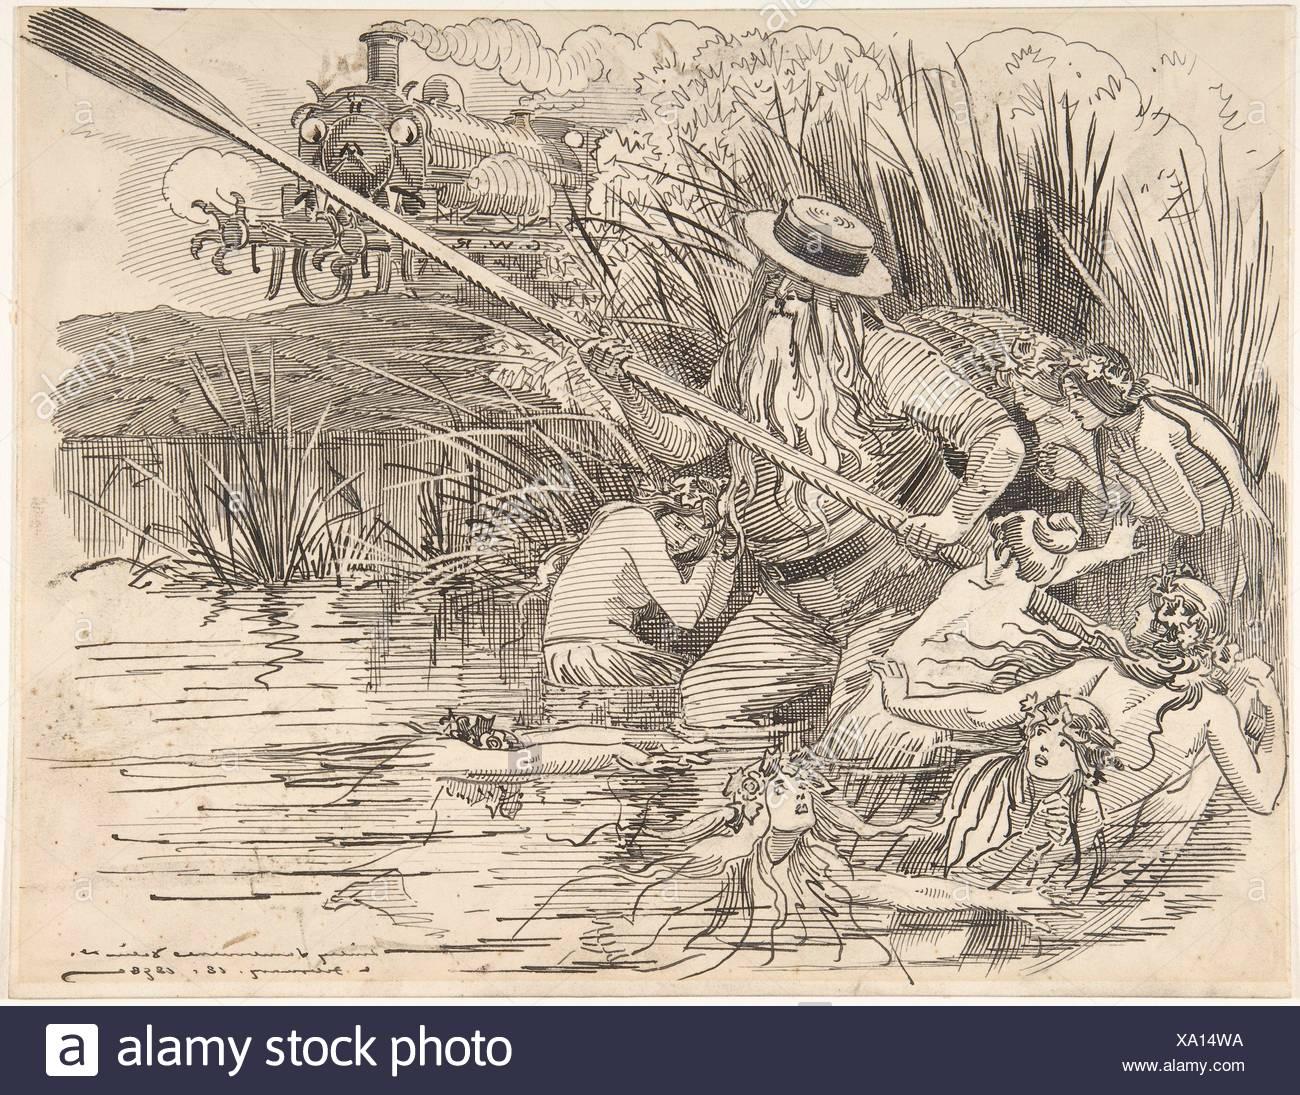 Cartoon for Punch (The Great Western Railway), Feb. 18, 1898. Artist: Sir (Edward) Linley Sambourne (British, London 1844-1910 Kensington, London); - Stock Image